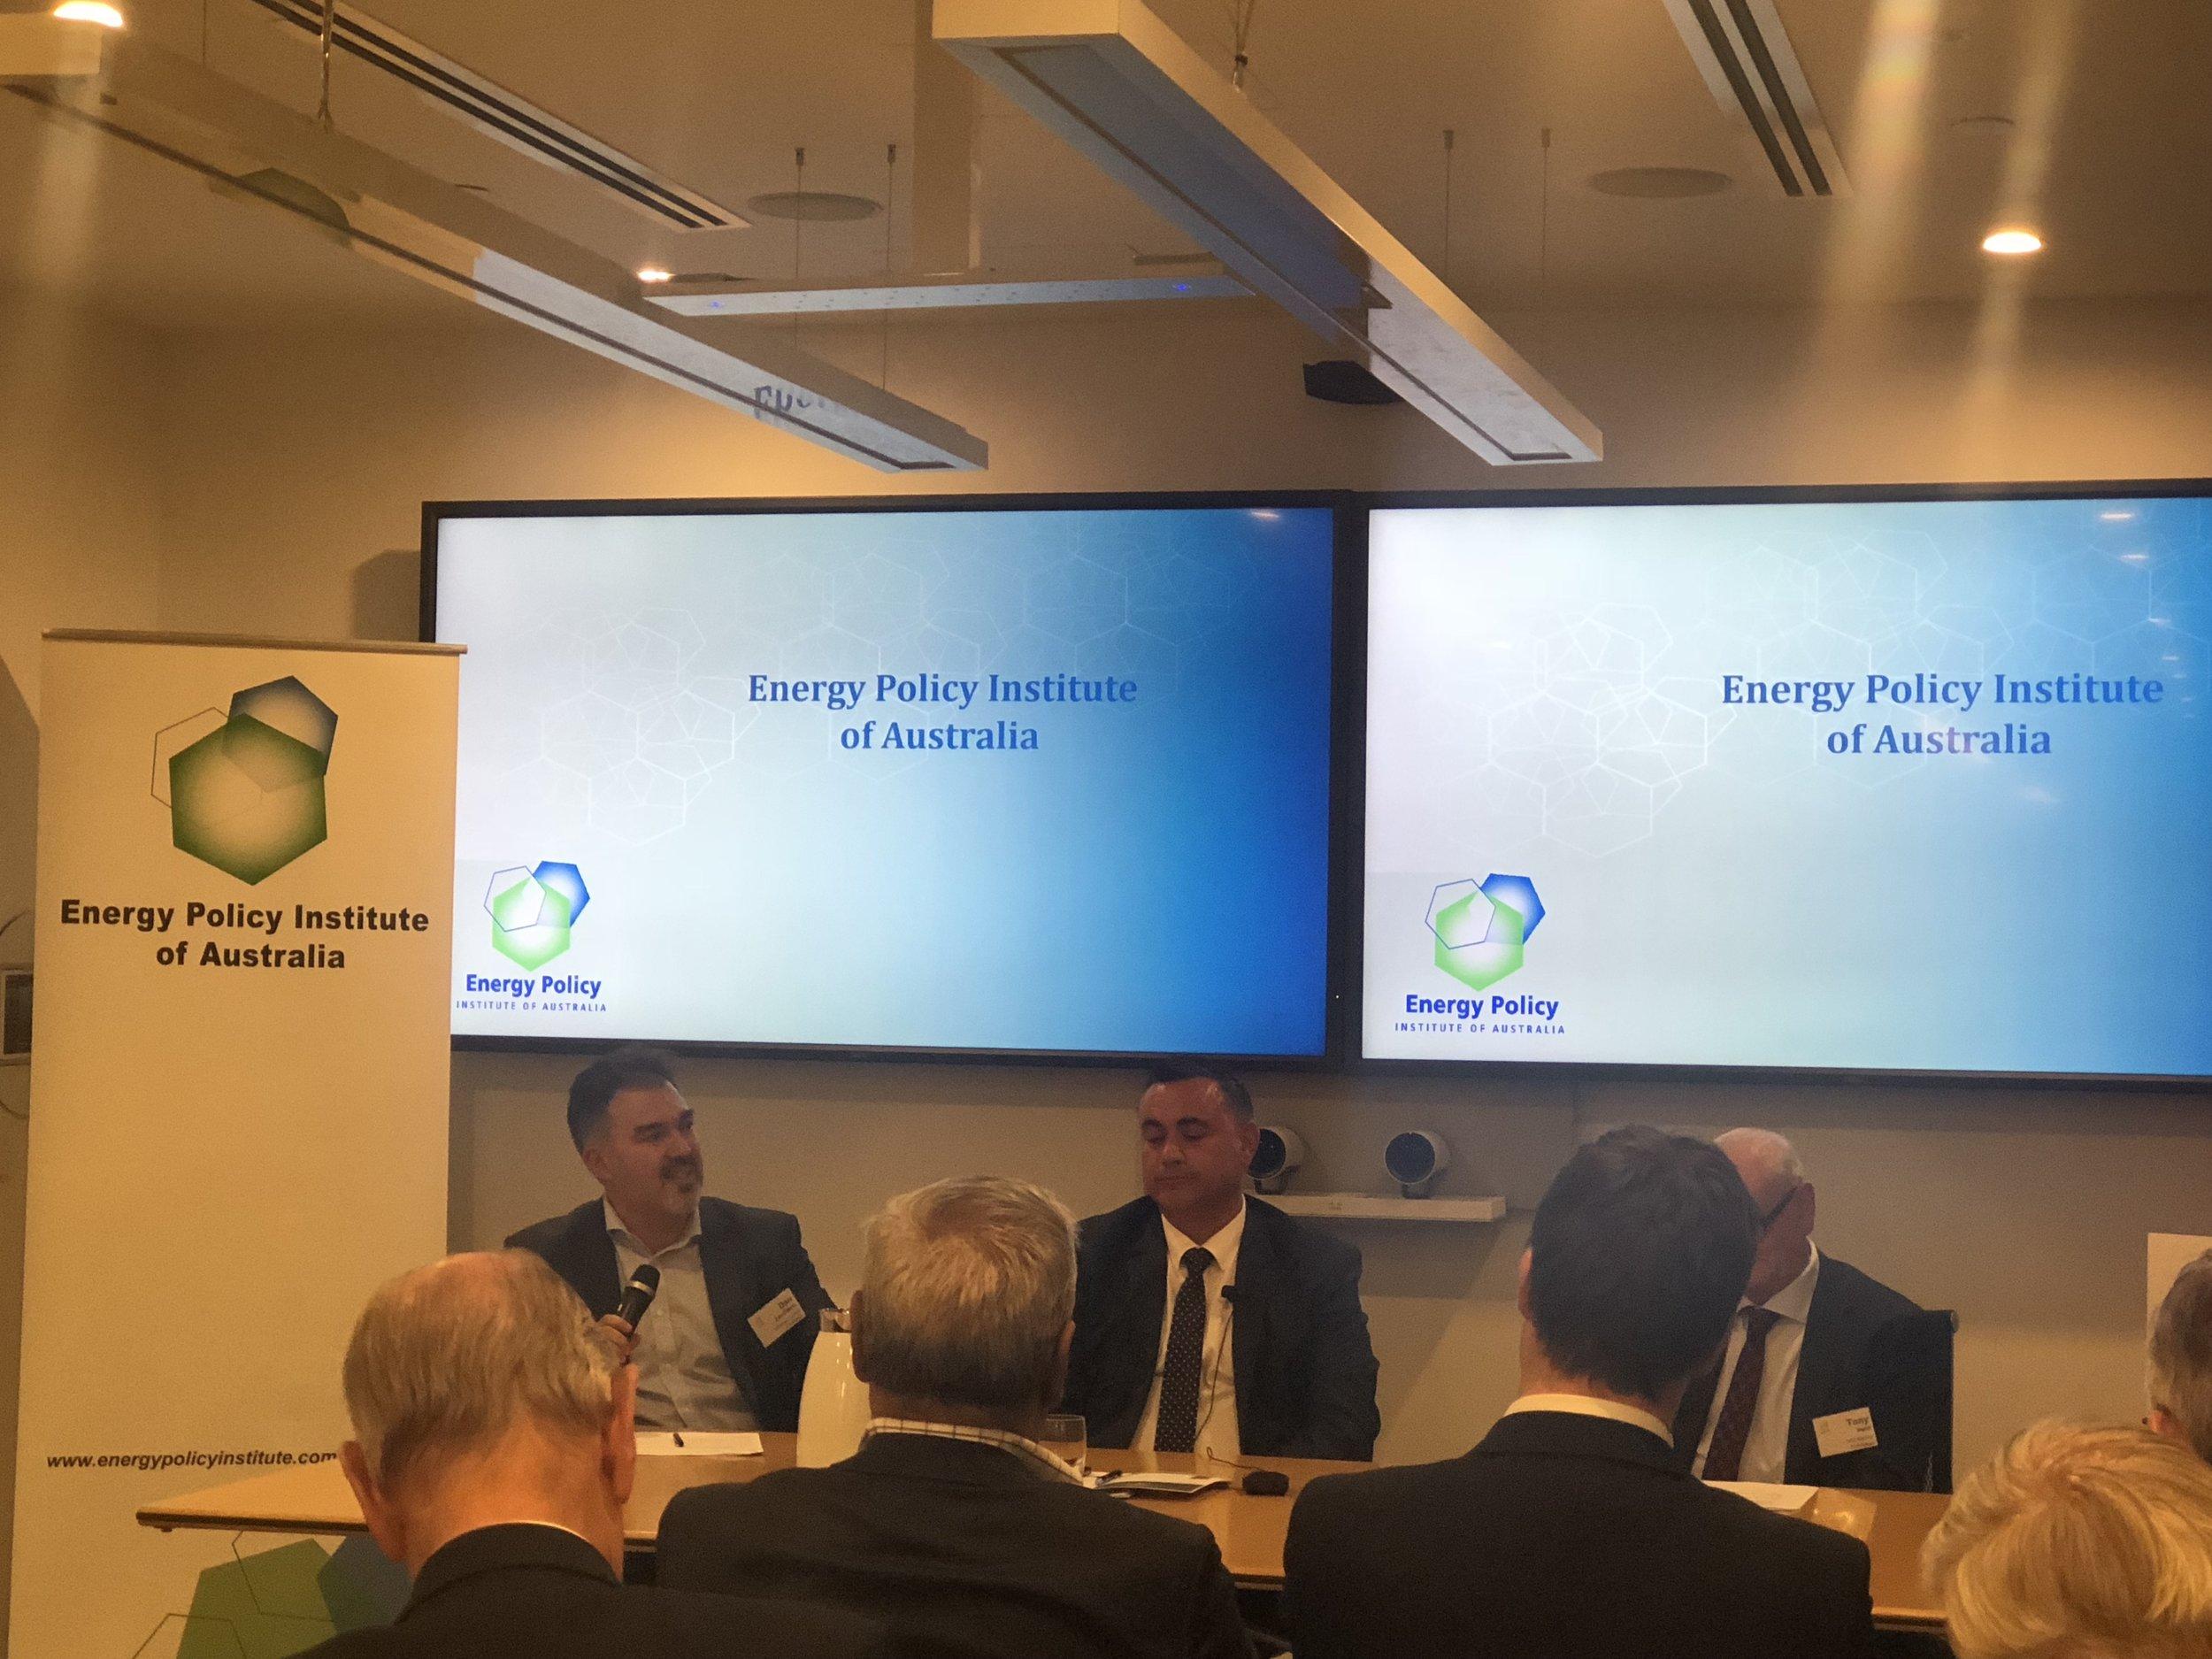 Speakers L-R Daniel Zavattiero (Minerals Council of Australia), John Barilaro MP (NSW National Party), Tony Irwin (SMR Nuclear Technologies)